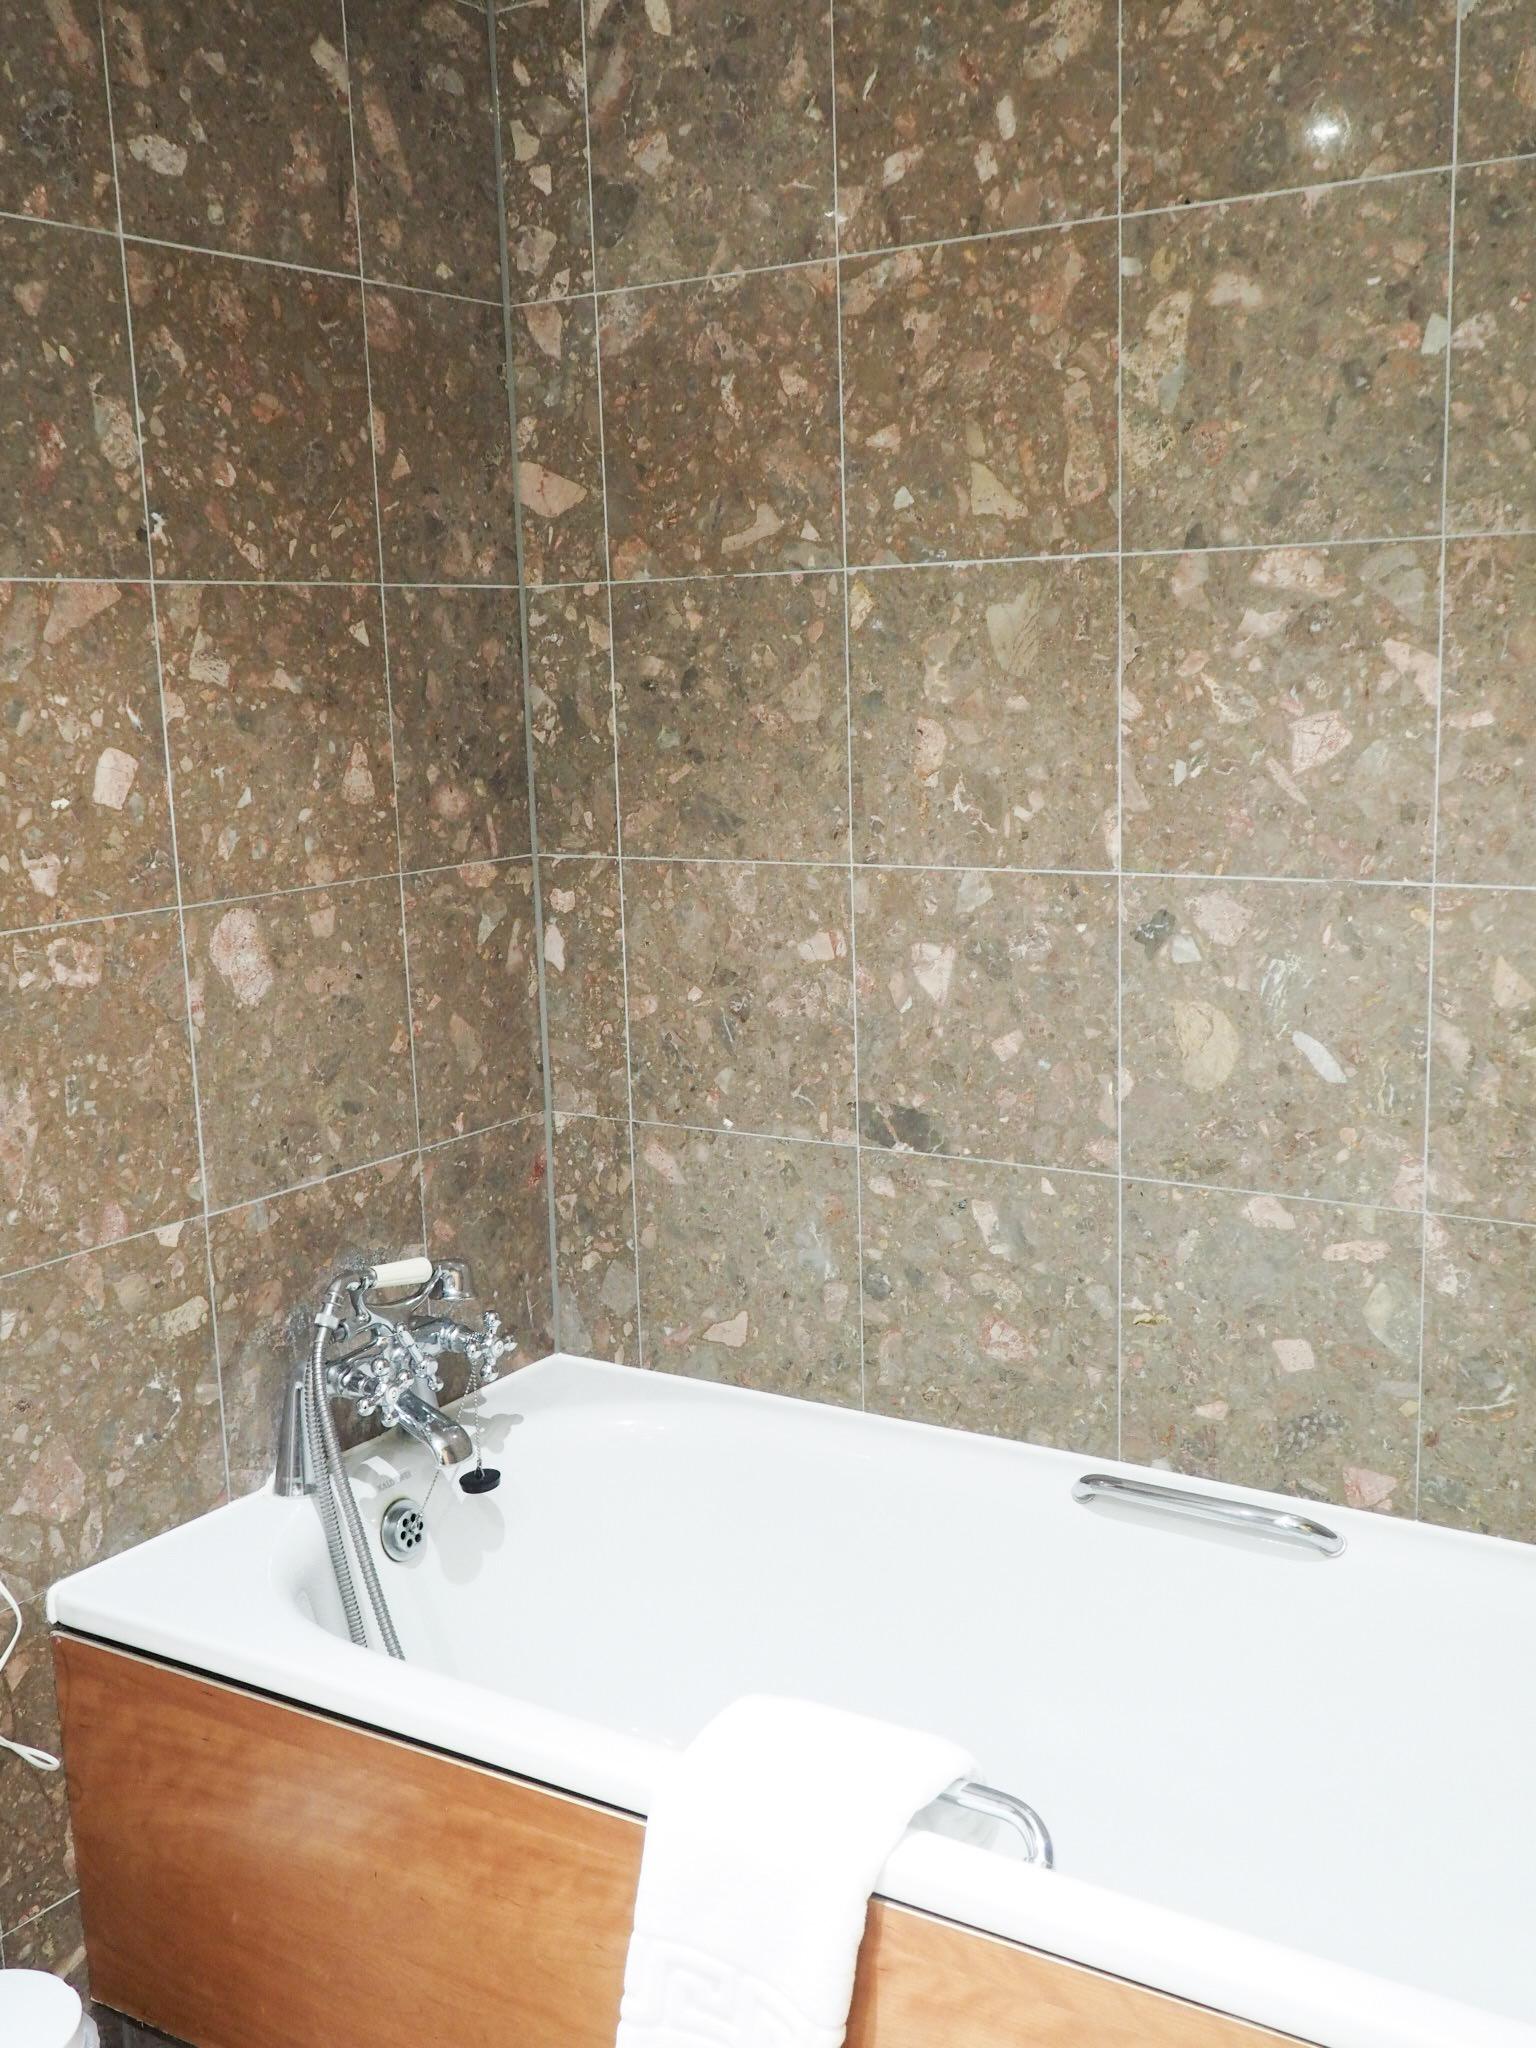 Crowne Plaza Resort Colchester bath